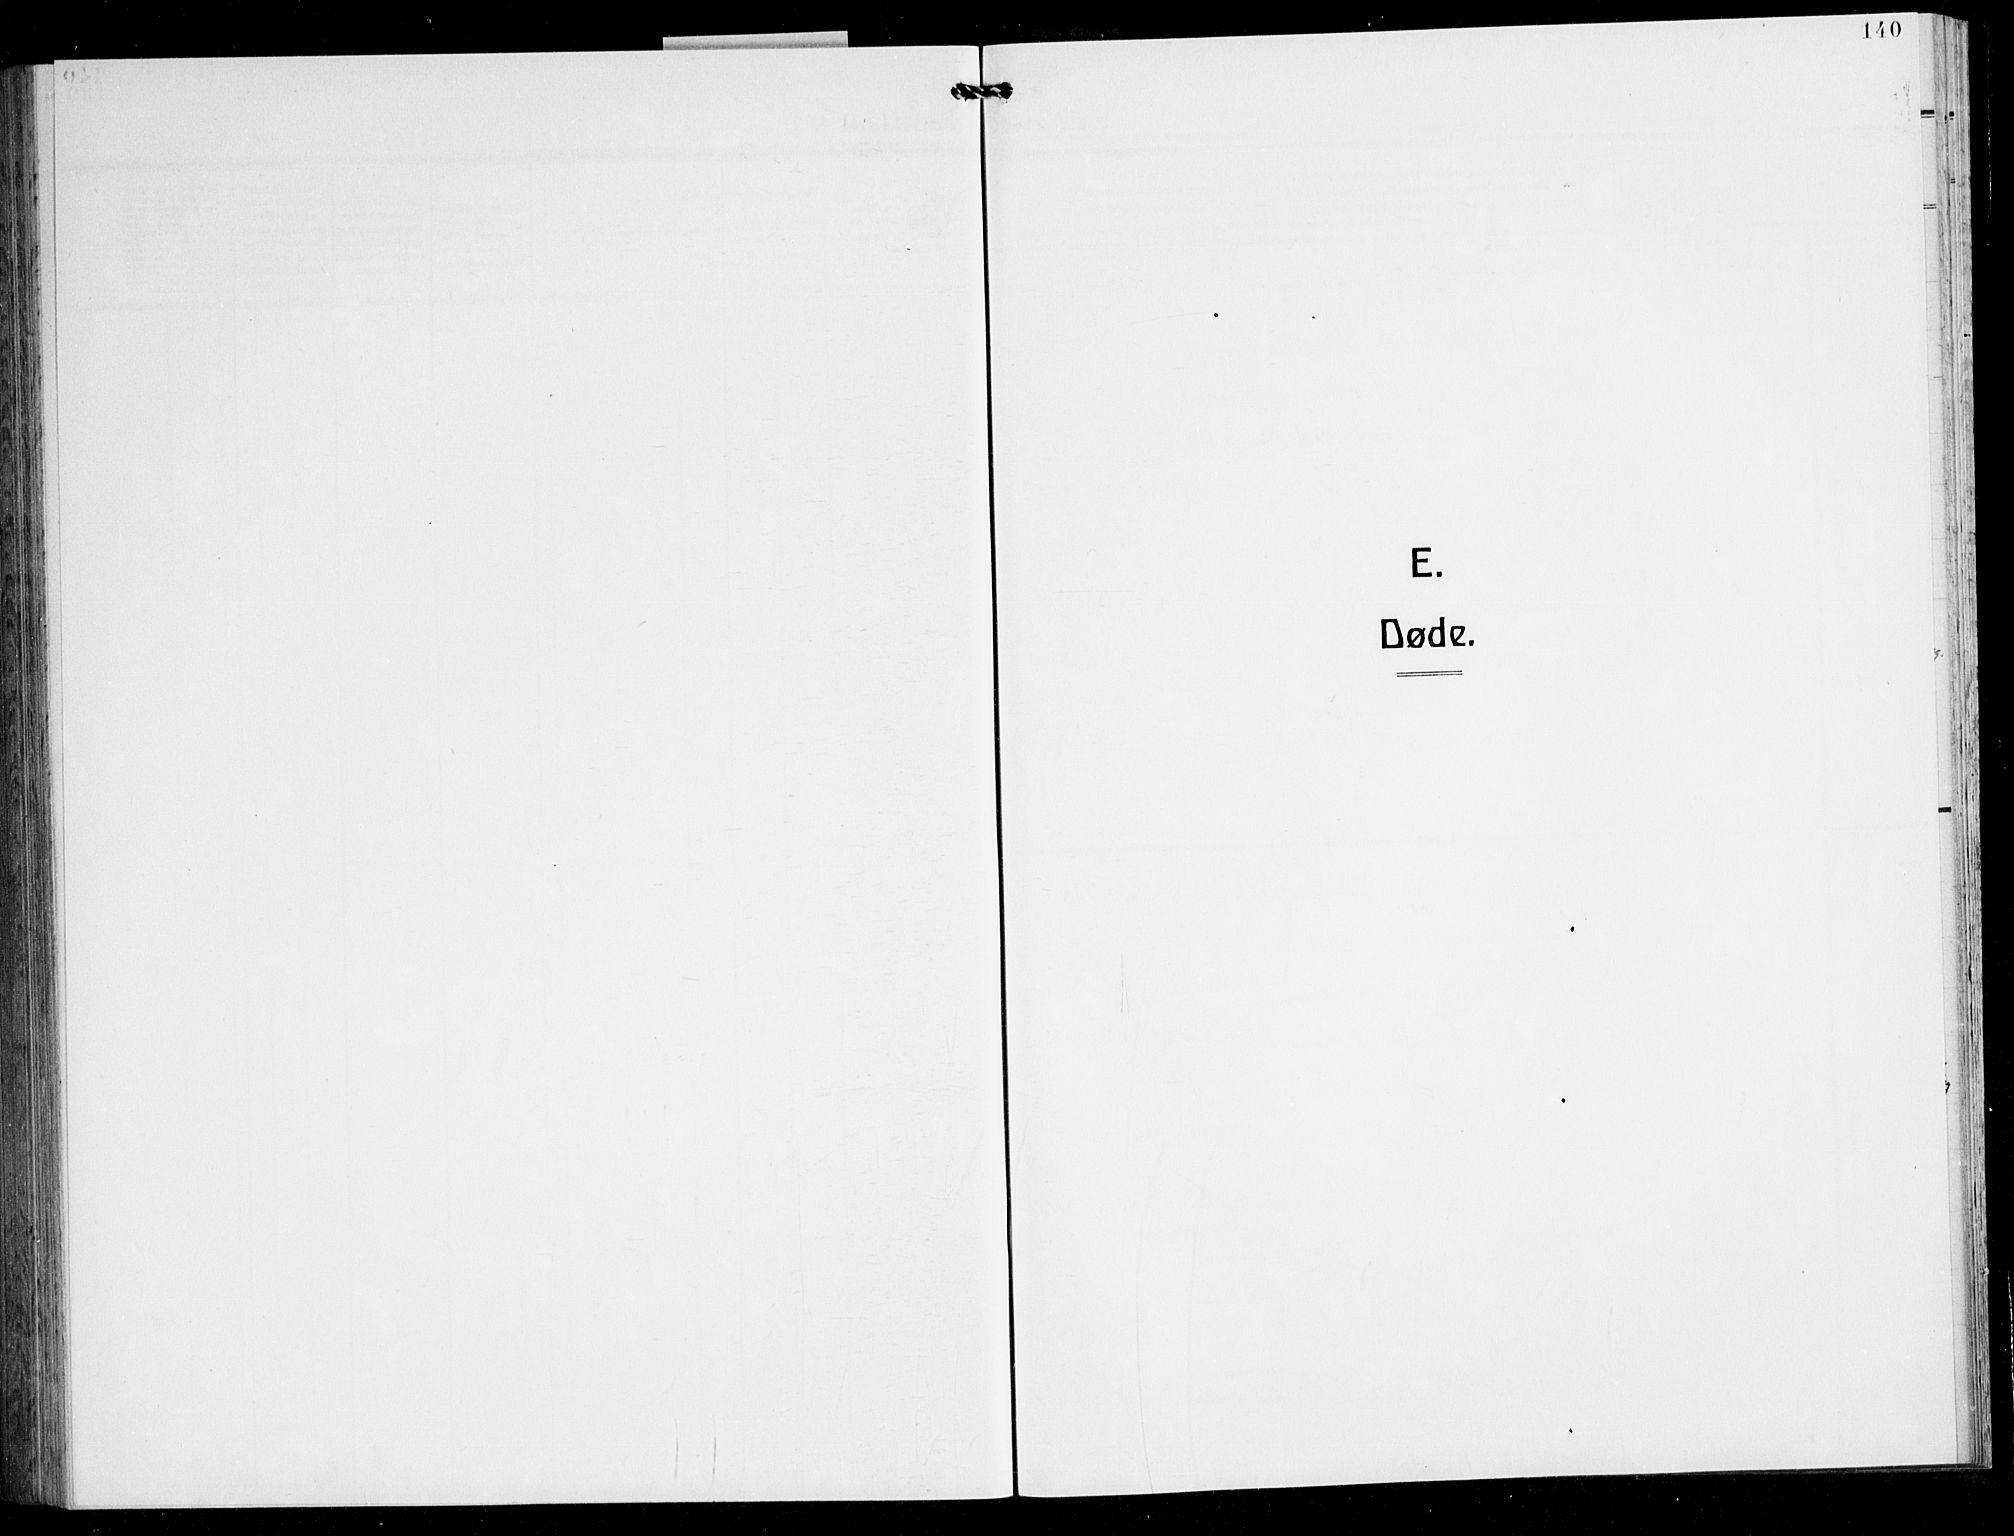 SAB, Finnås sokneprestembete, H/Ha/Hab/Haba/L0005: Klokkerbok nr. A 5, 1924-1945, s. 140